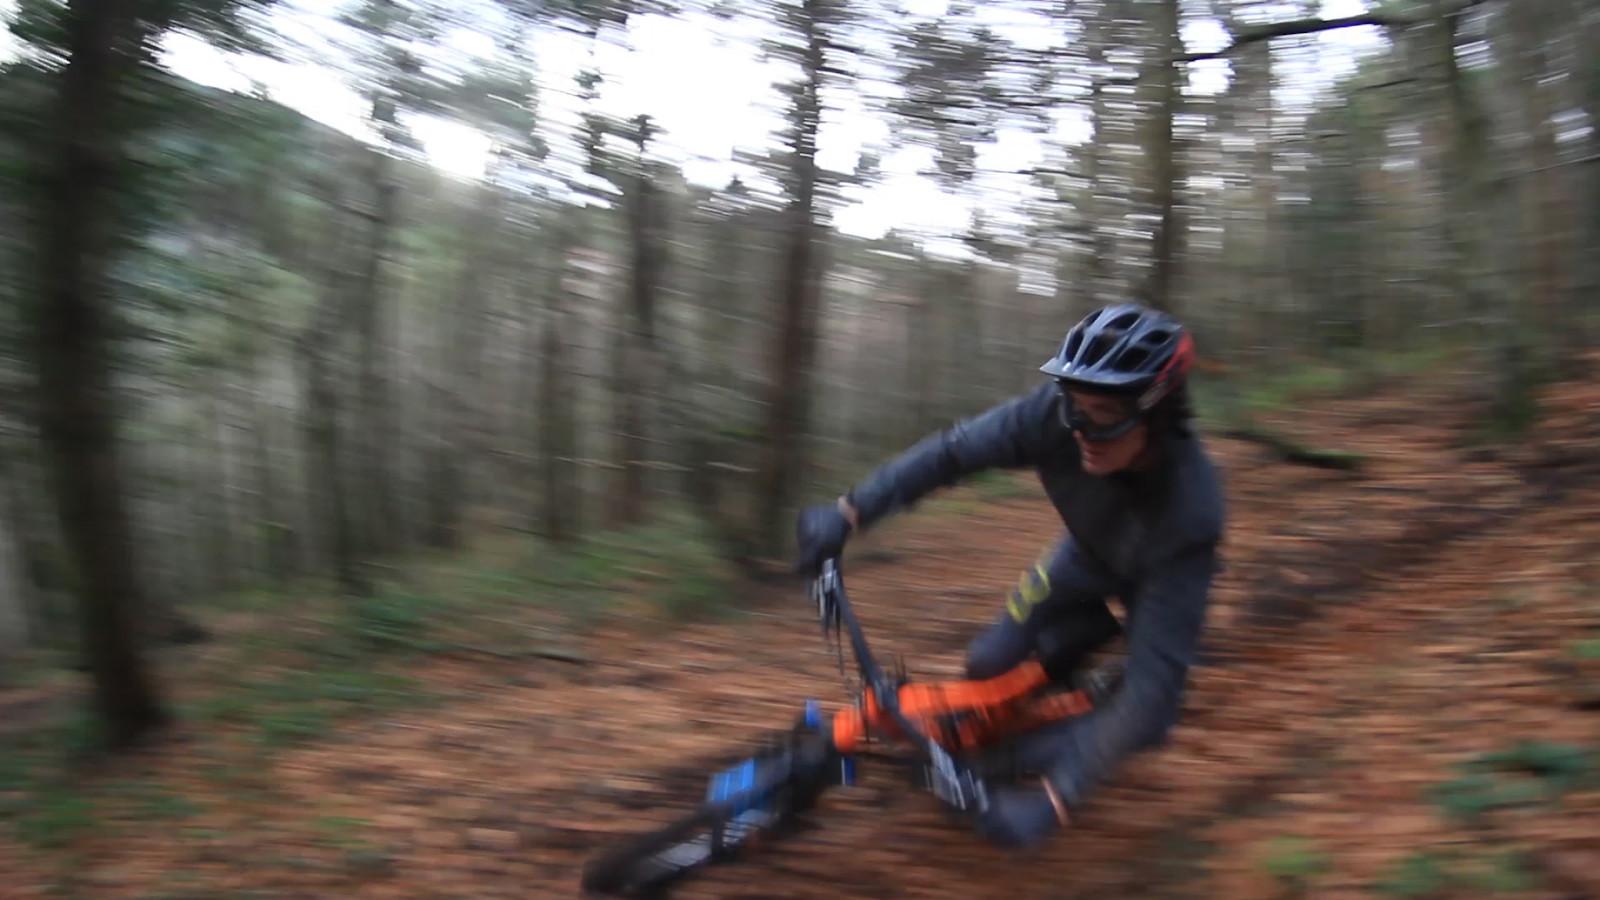 Rowan Sorrell - Matthew Davies - Mountain Biking Pictures - Vital MTB